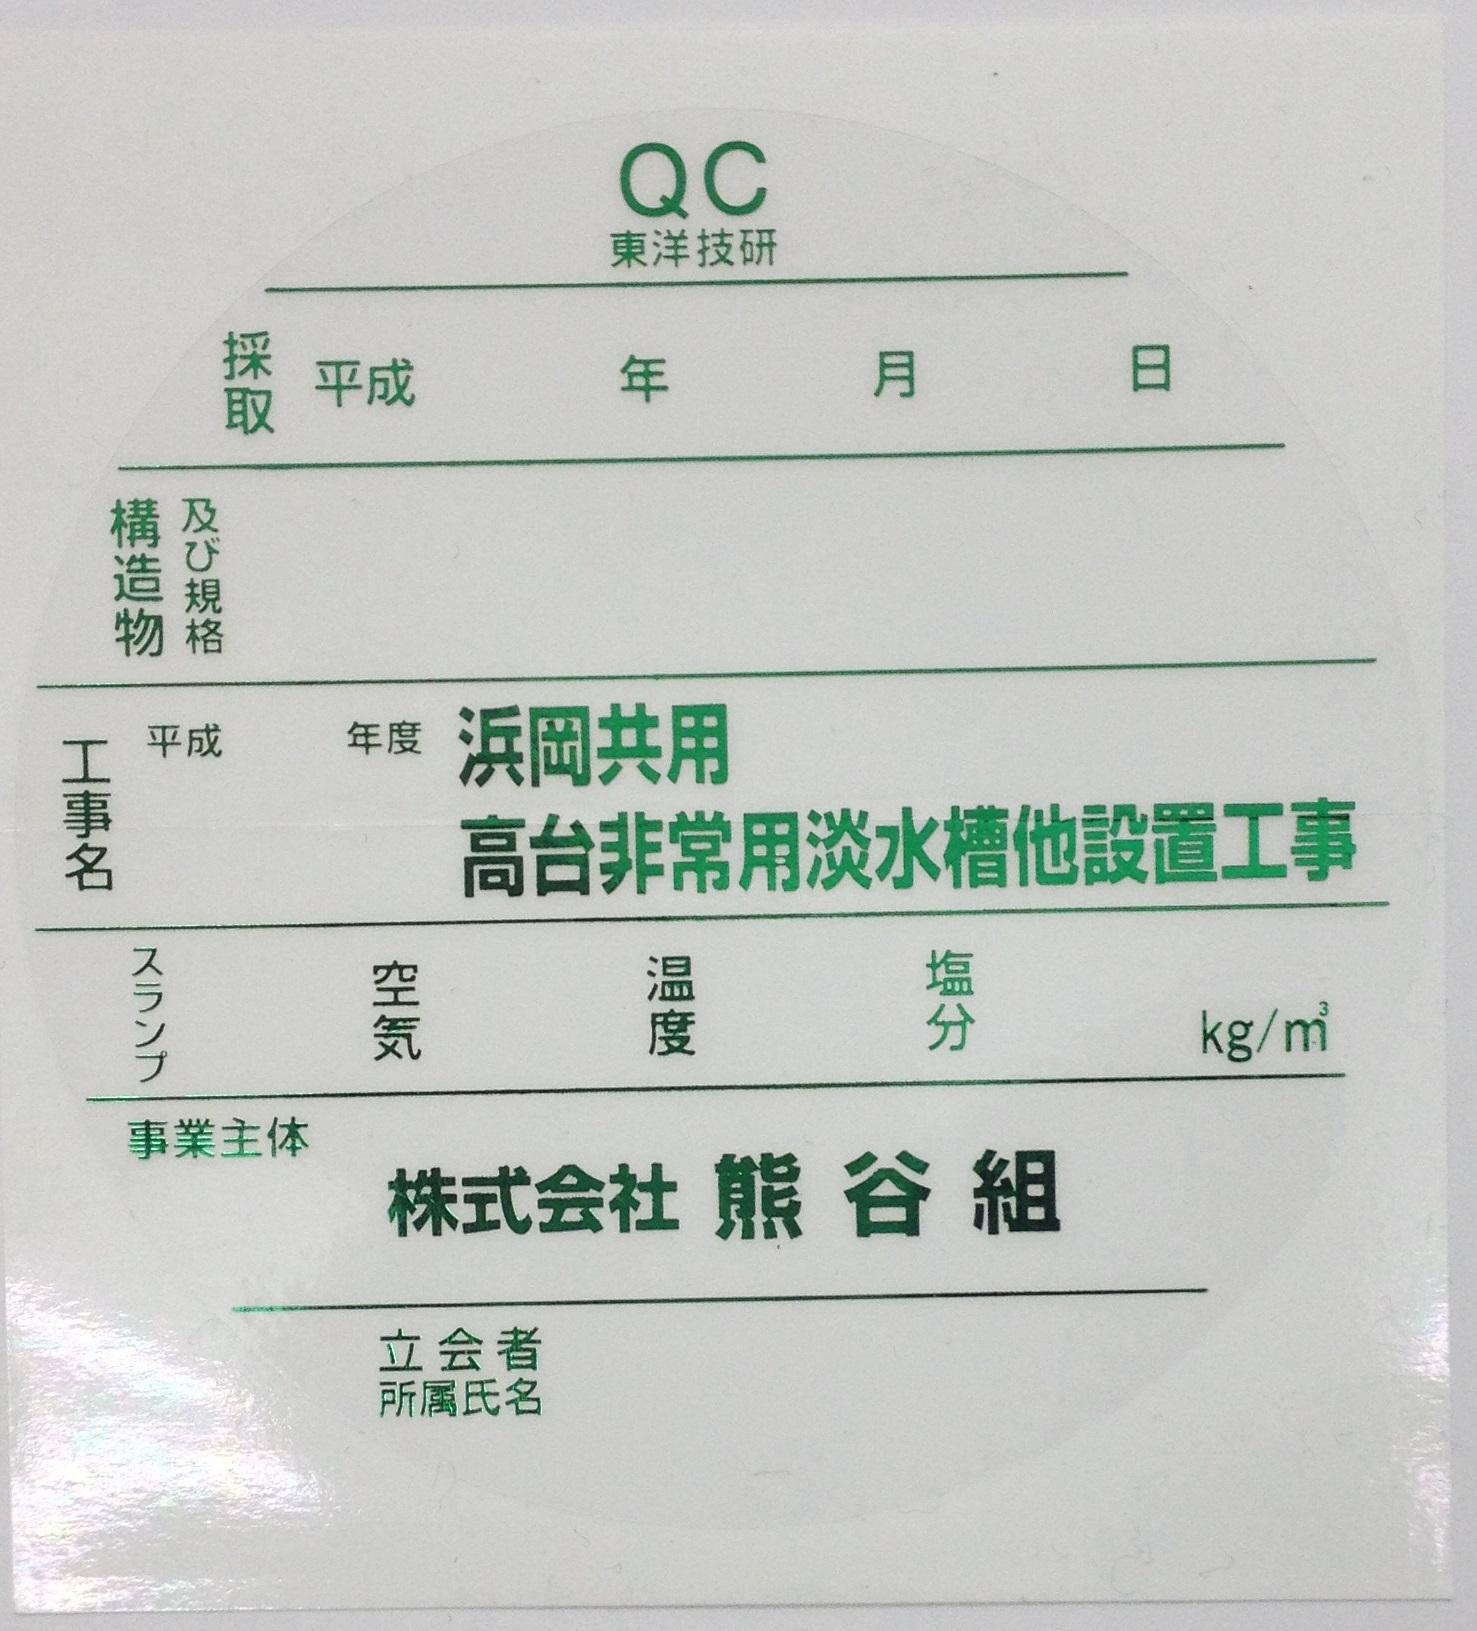 株式会社熊谷組のQC版